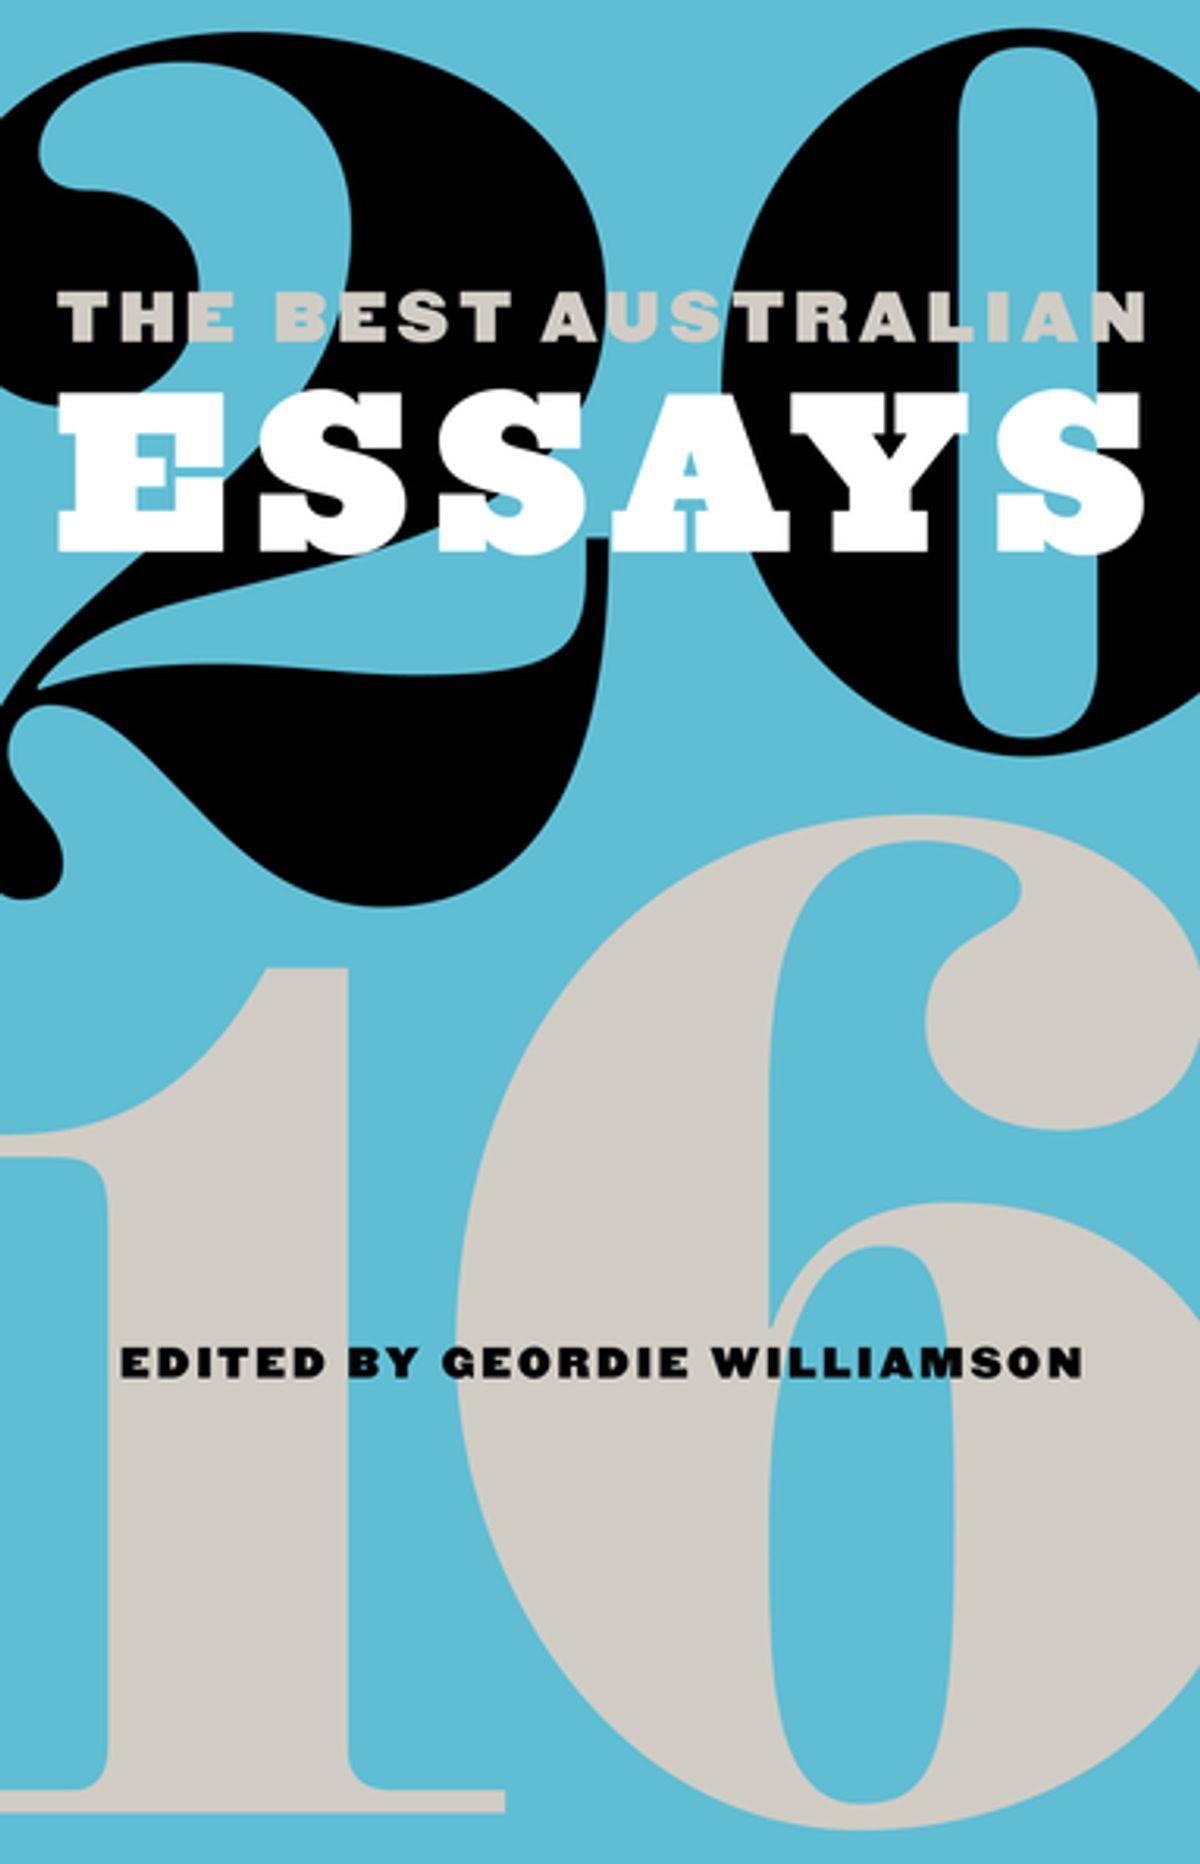 009 The Best Australian Essays Essay Breathtaking 2016 Personal College Full